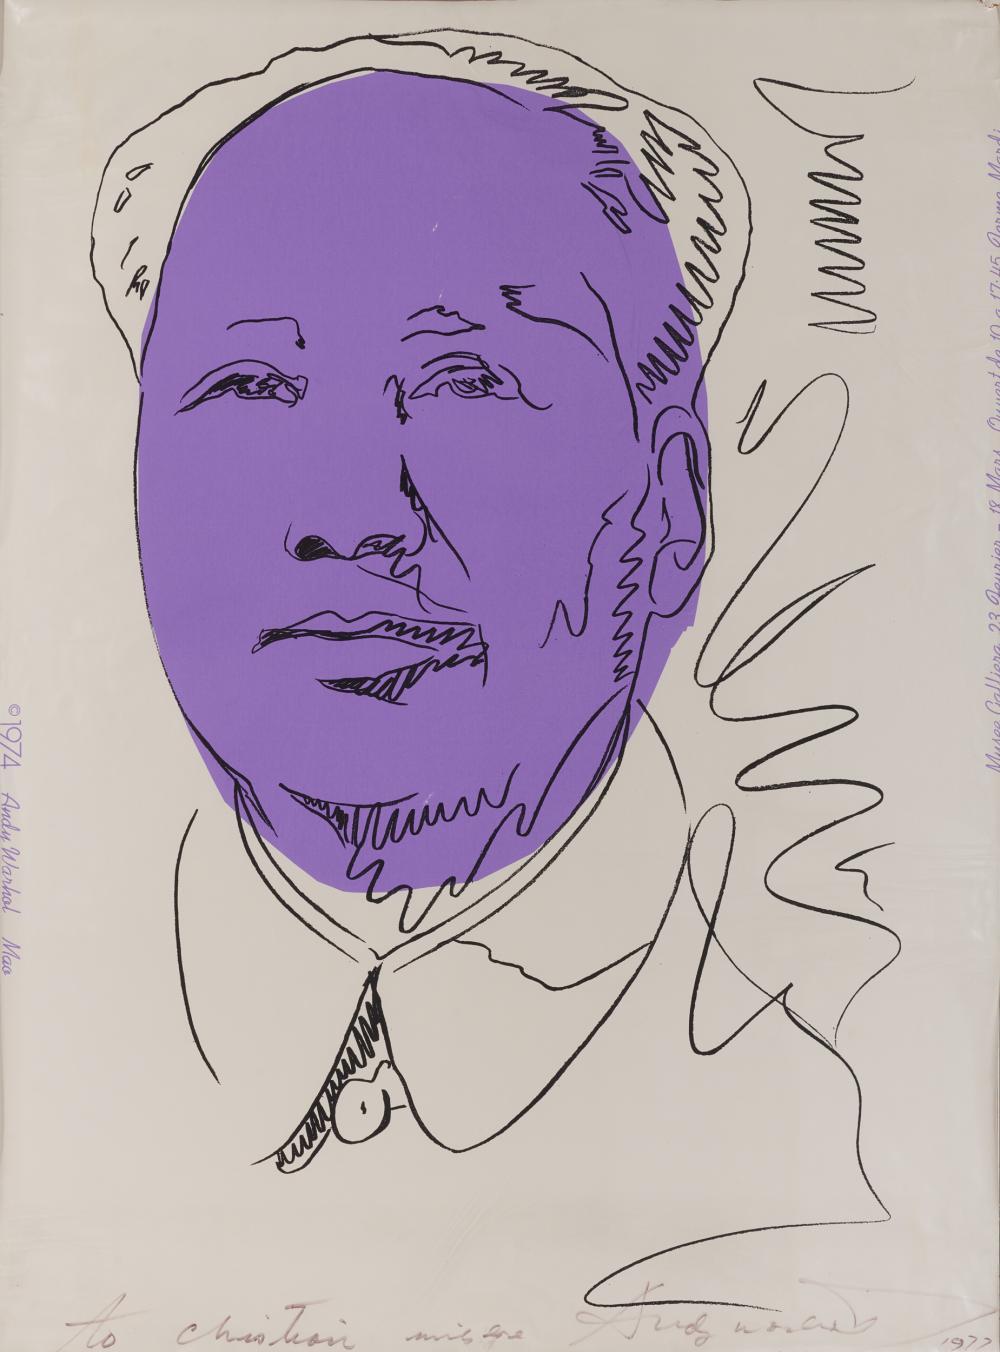 ANDY WARHOL, (American, 1928-1987), Mao (Wallpaper) (F. & S. II.125A), 1974, screenprint in colors, sight: 39 1/2 x 29 1/4 in., frame: 44 3/4 x 34 1/4 in.